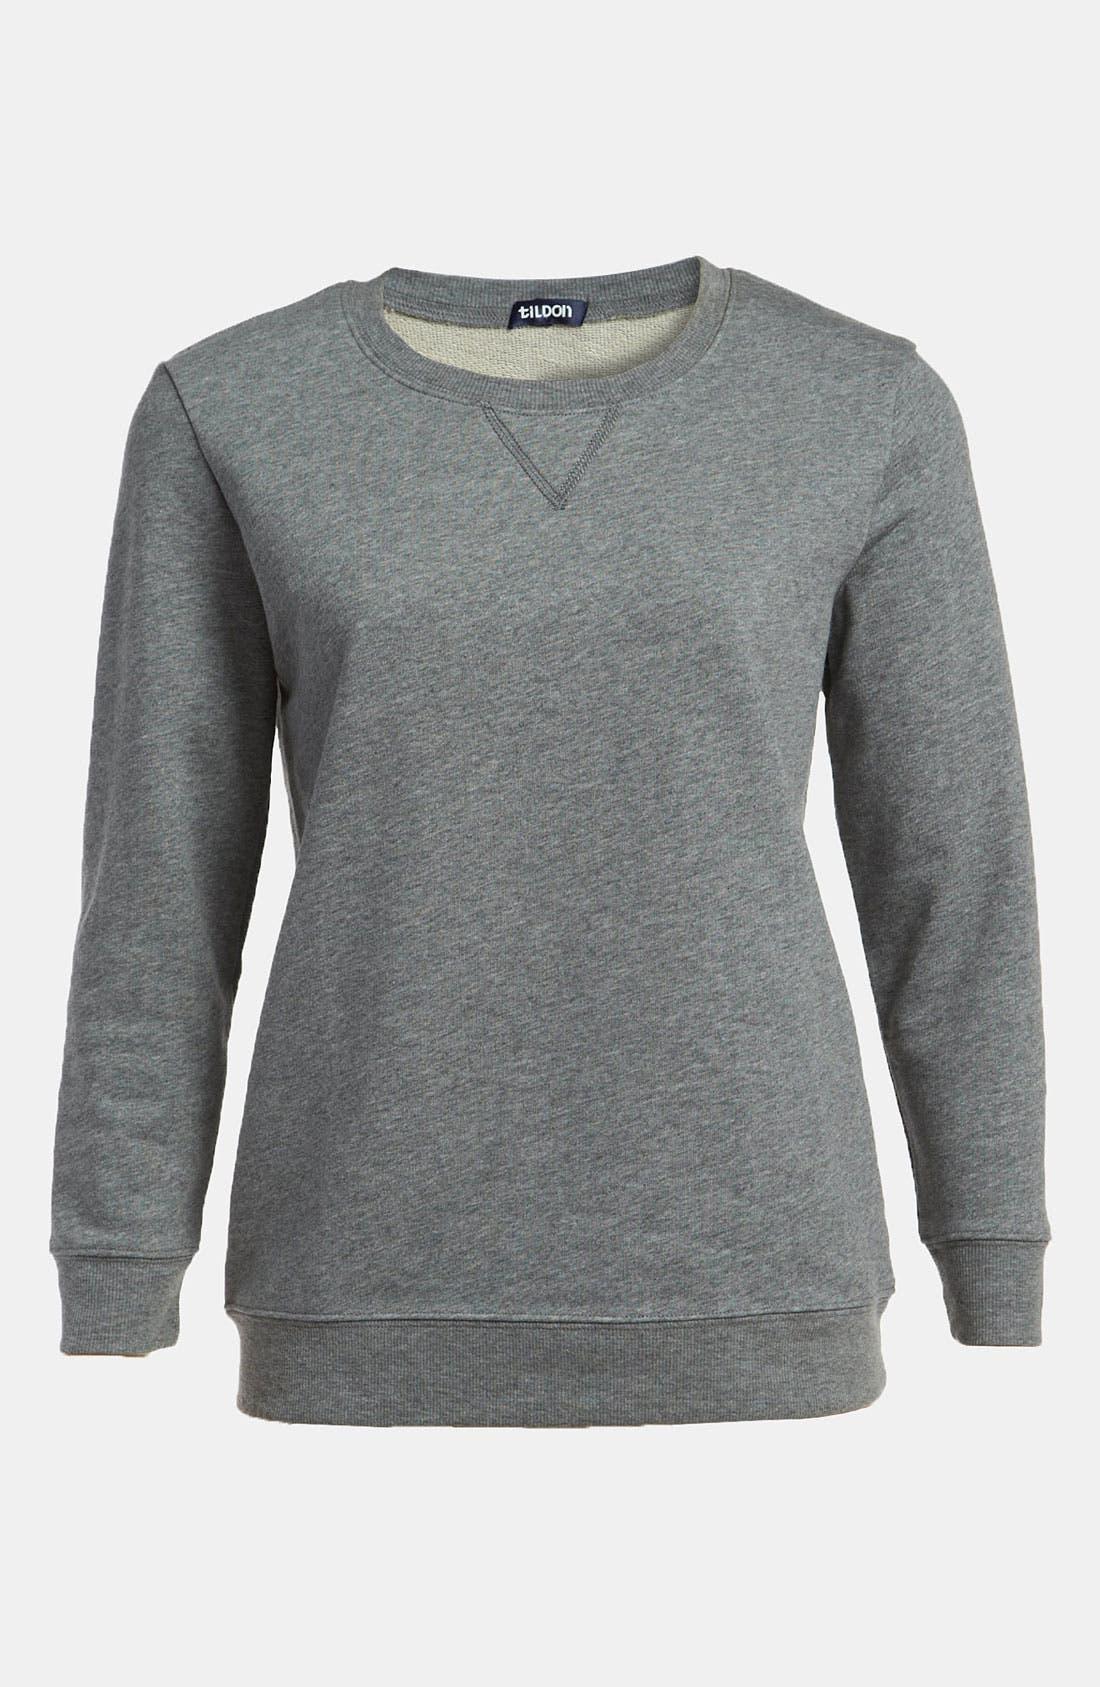 Main Image - Tildon Elbow Patch Sweatshirt